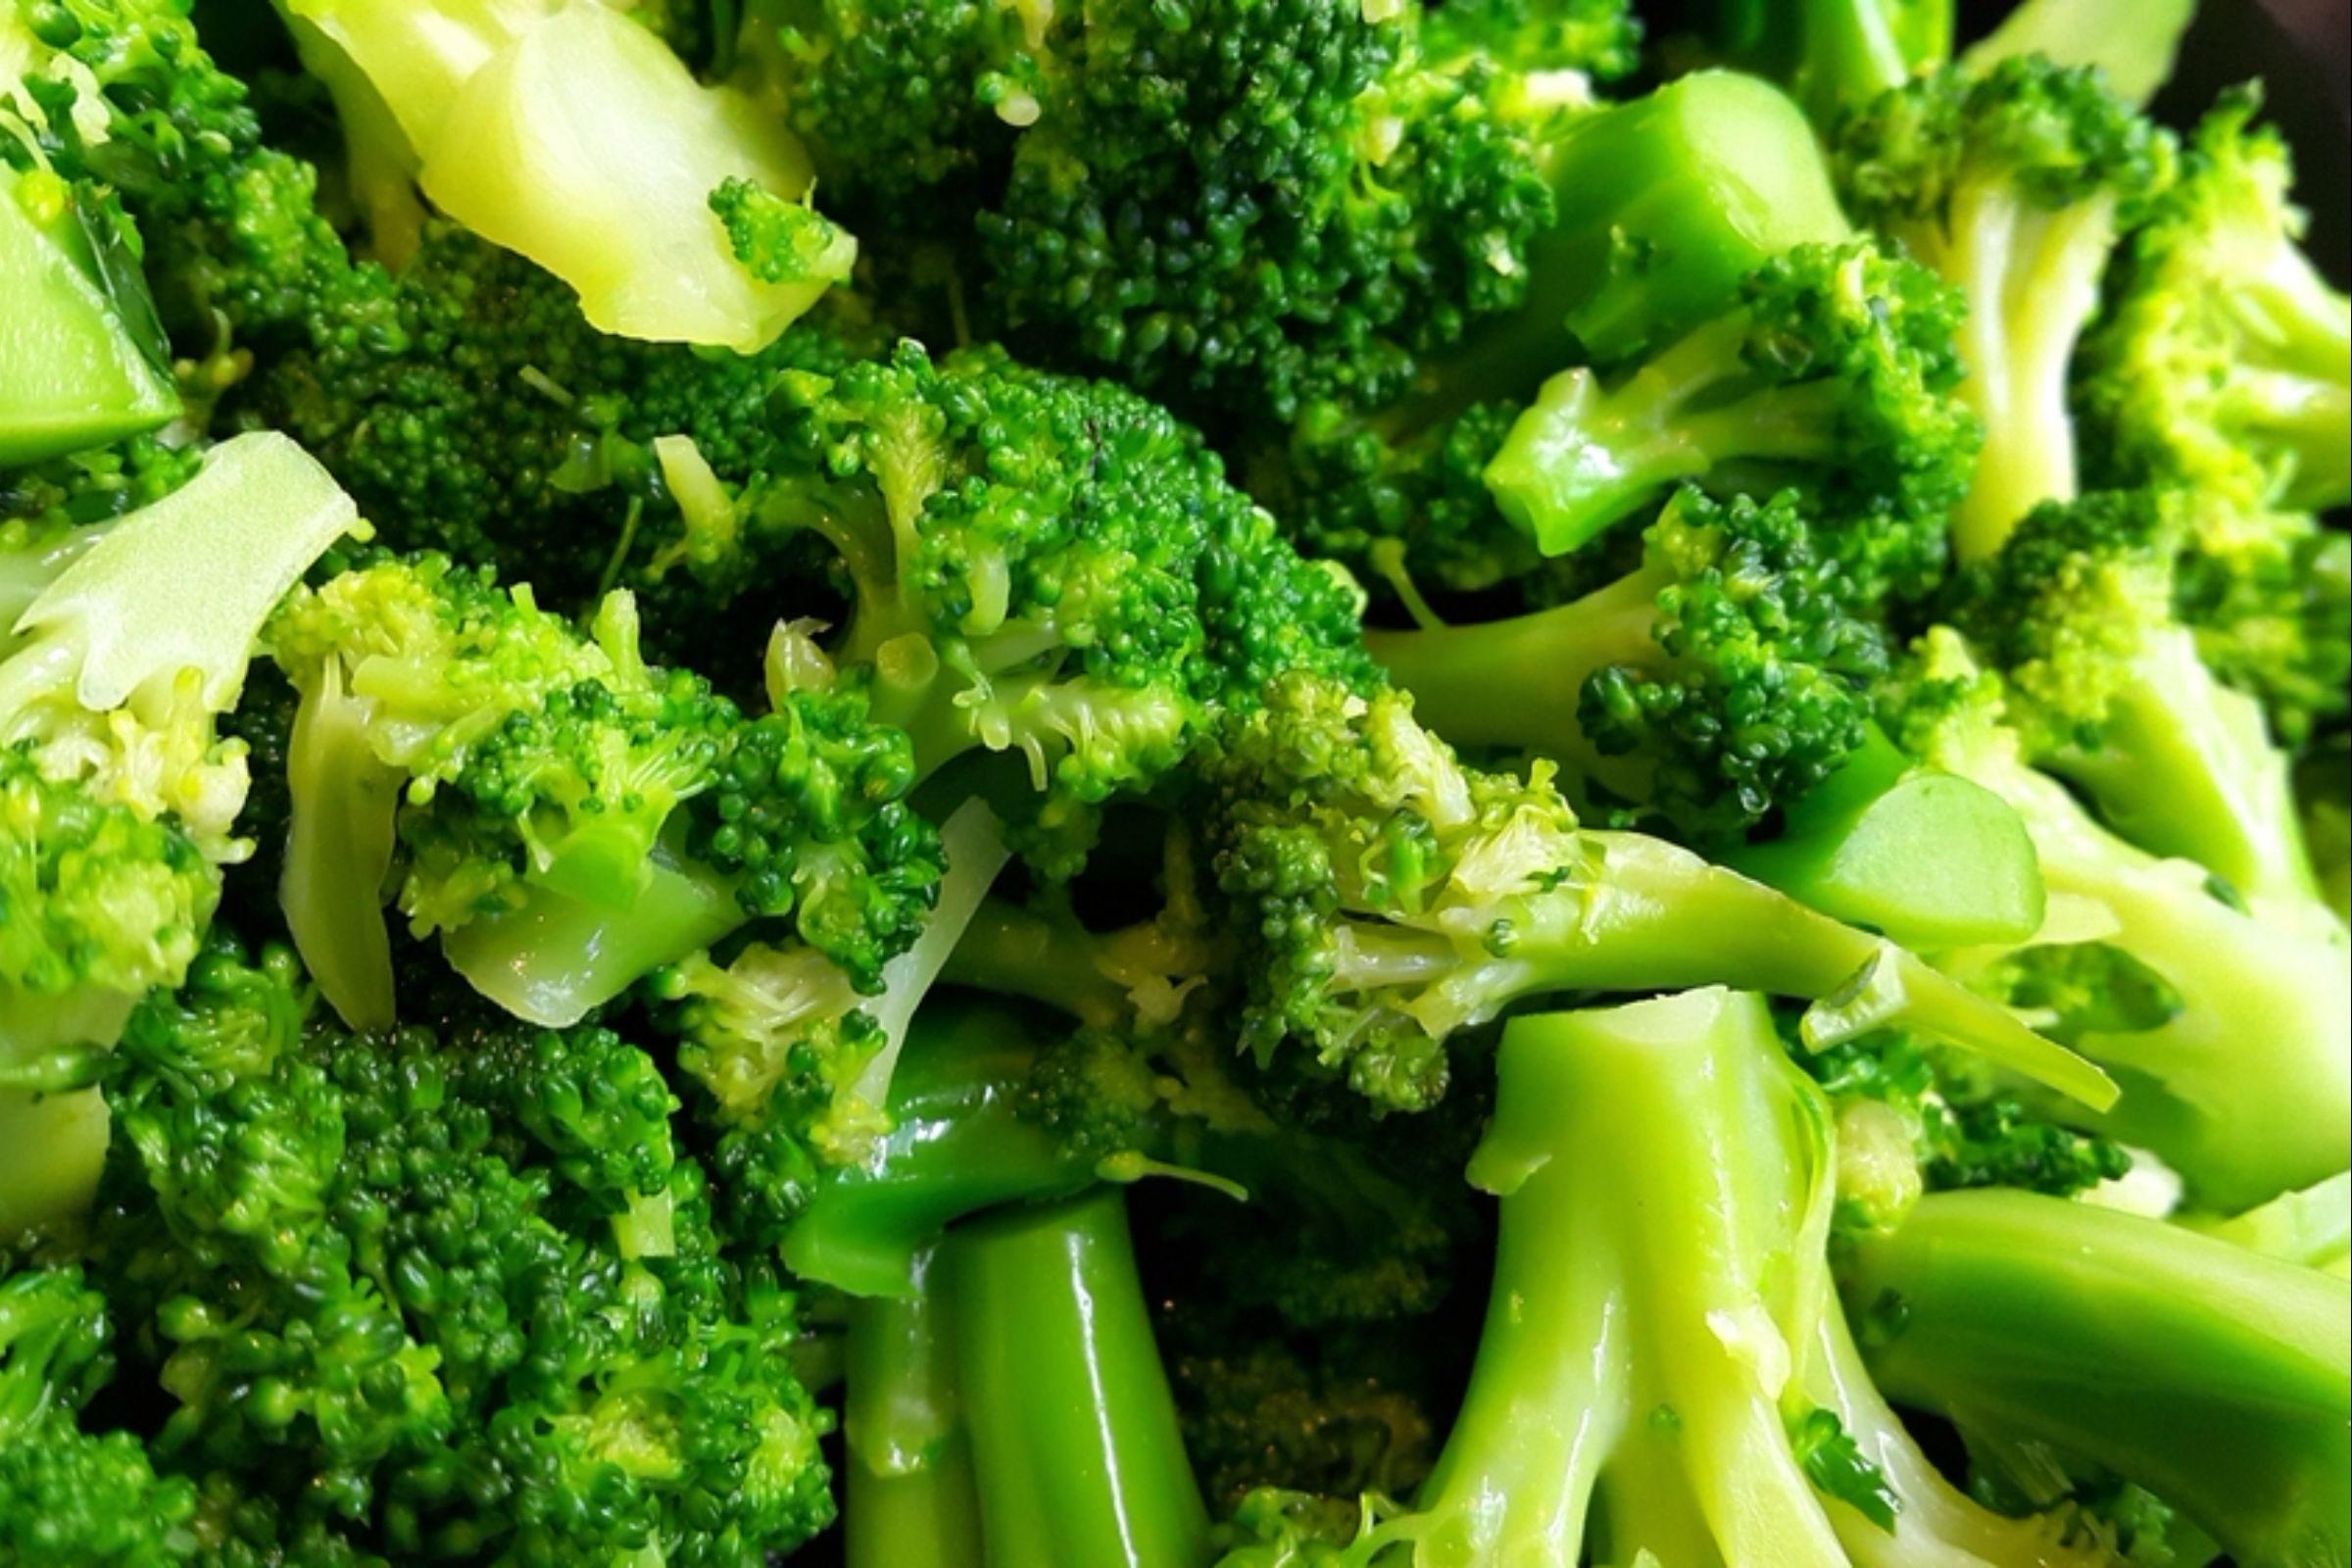 Pan-fried broccoli